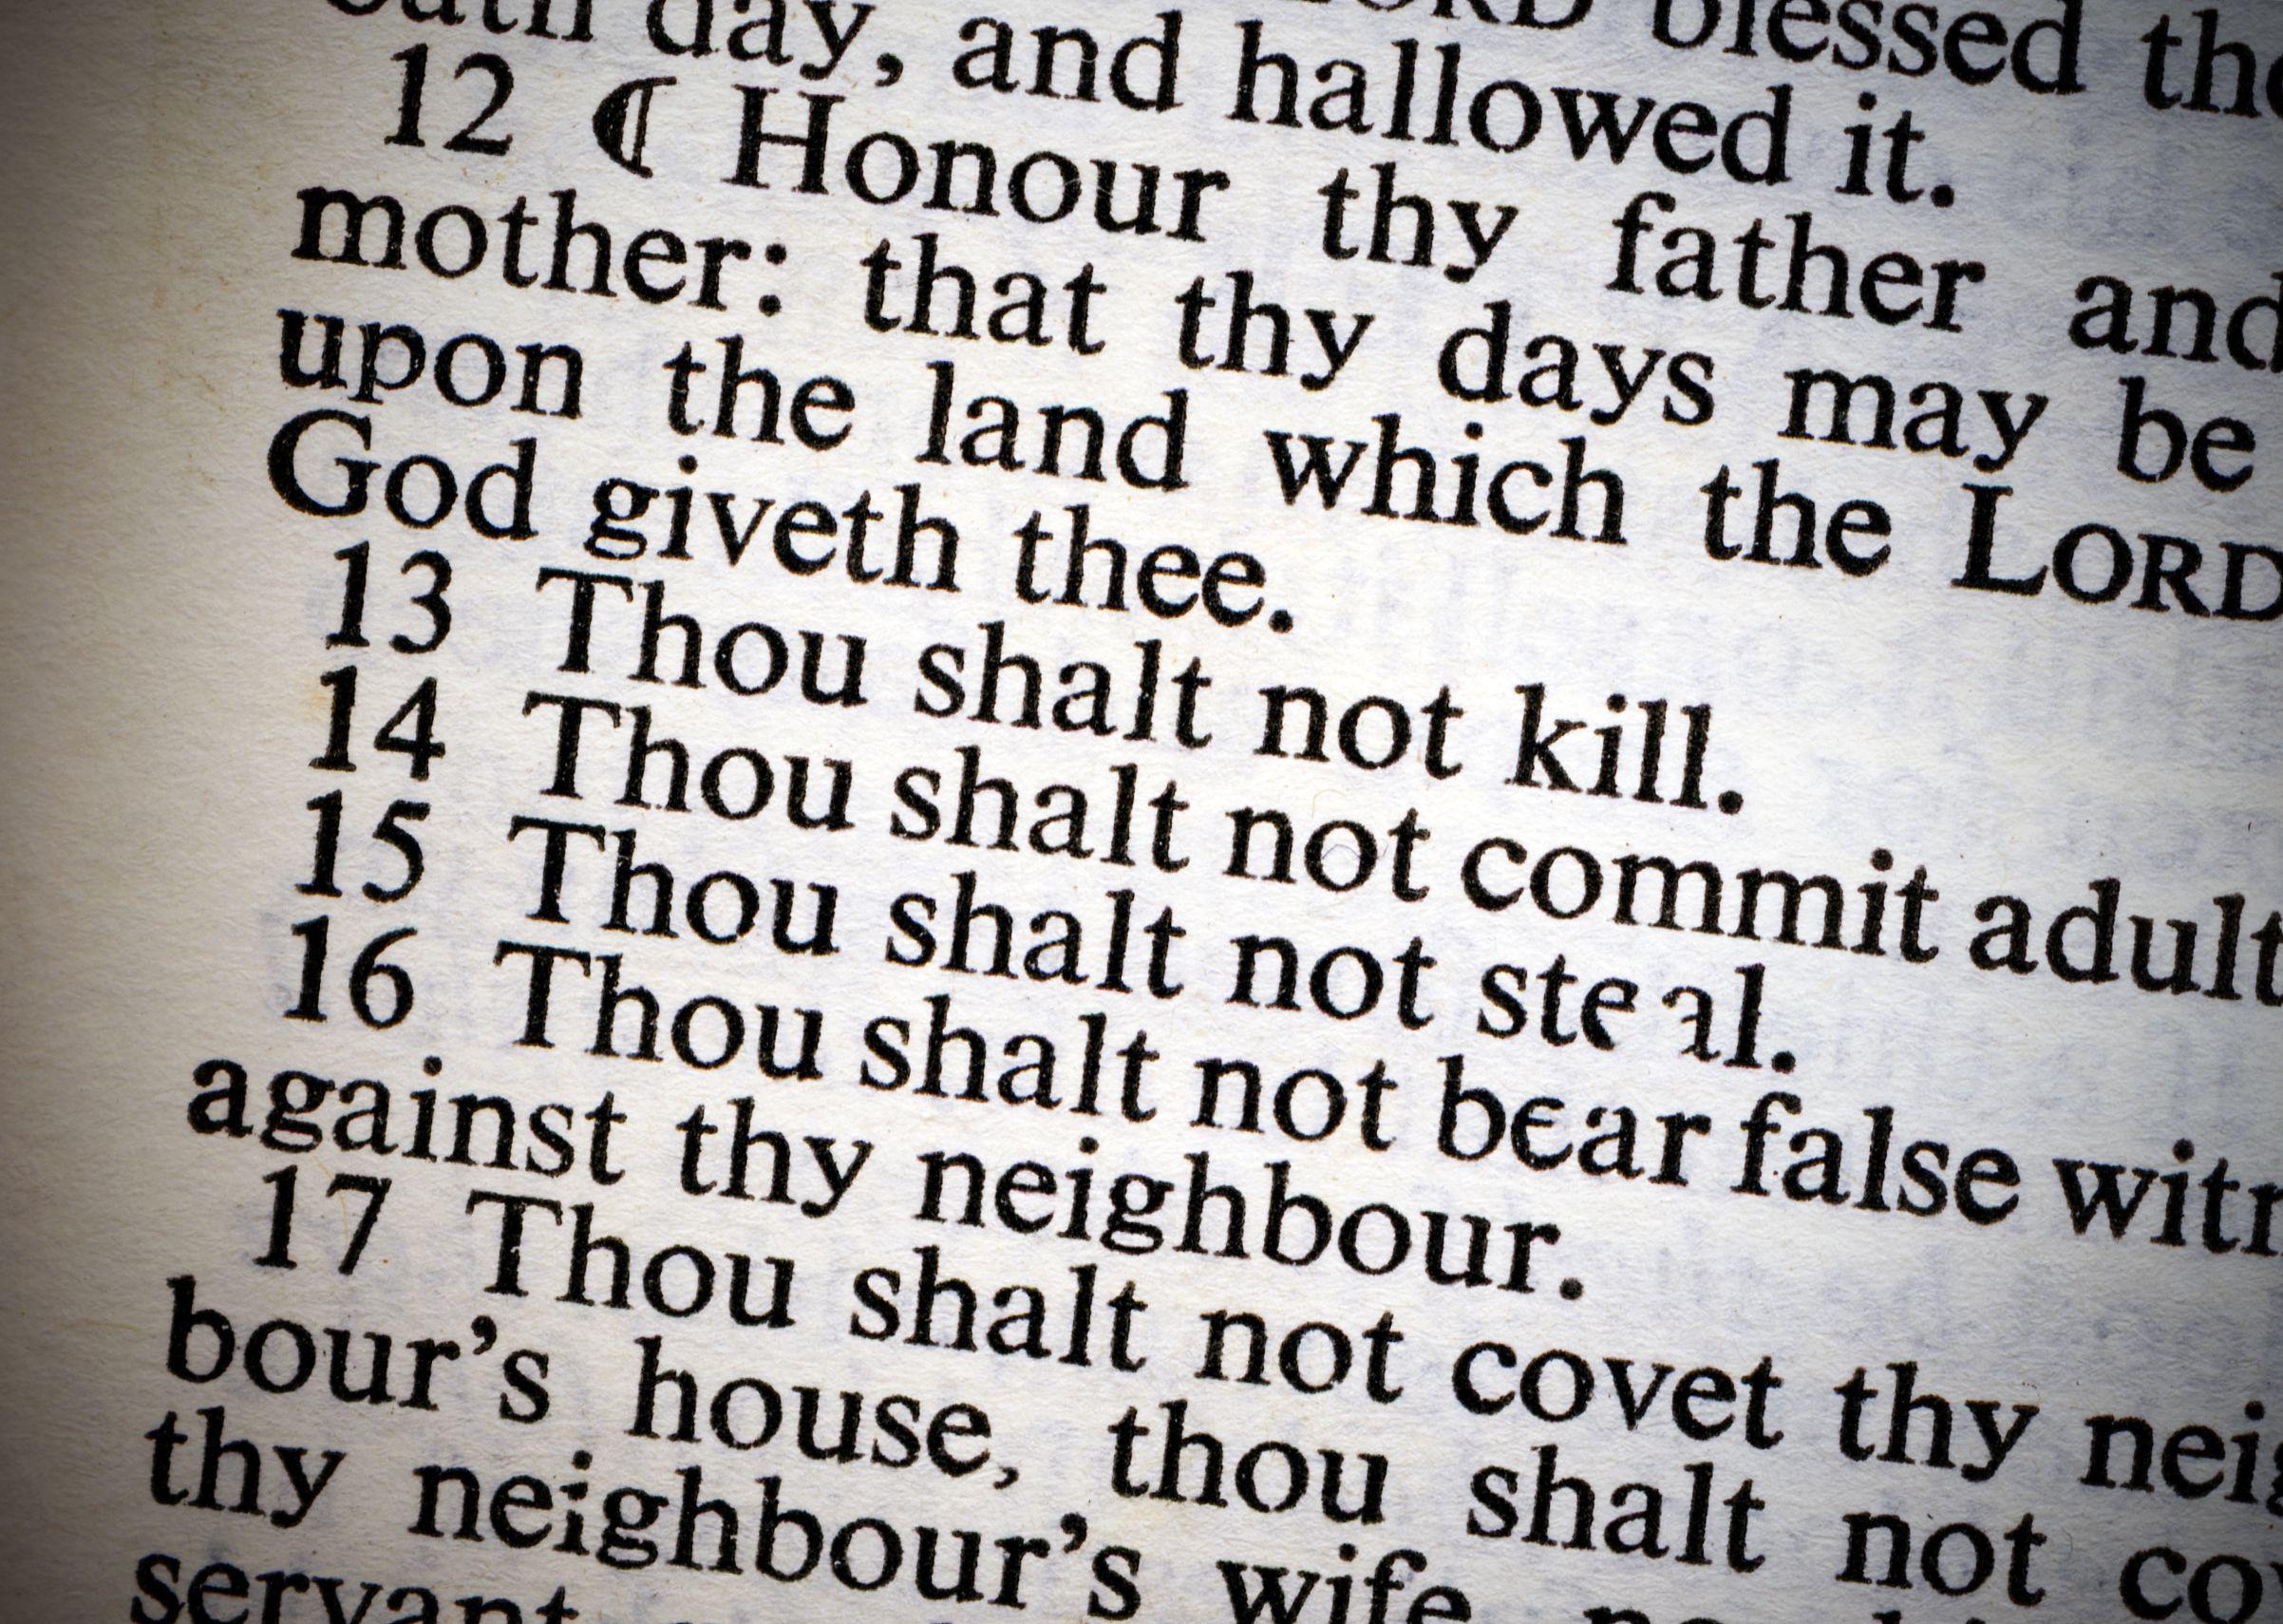 Ten Commandments: Basis for American Law?